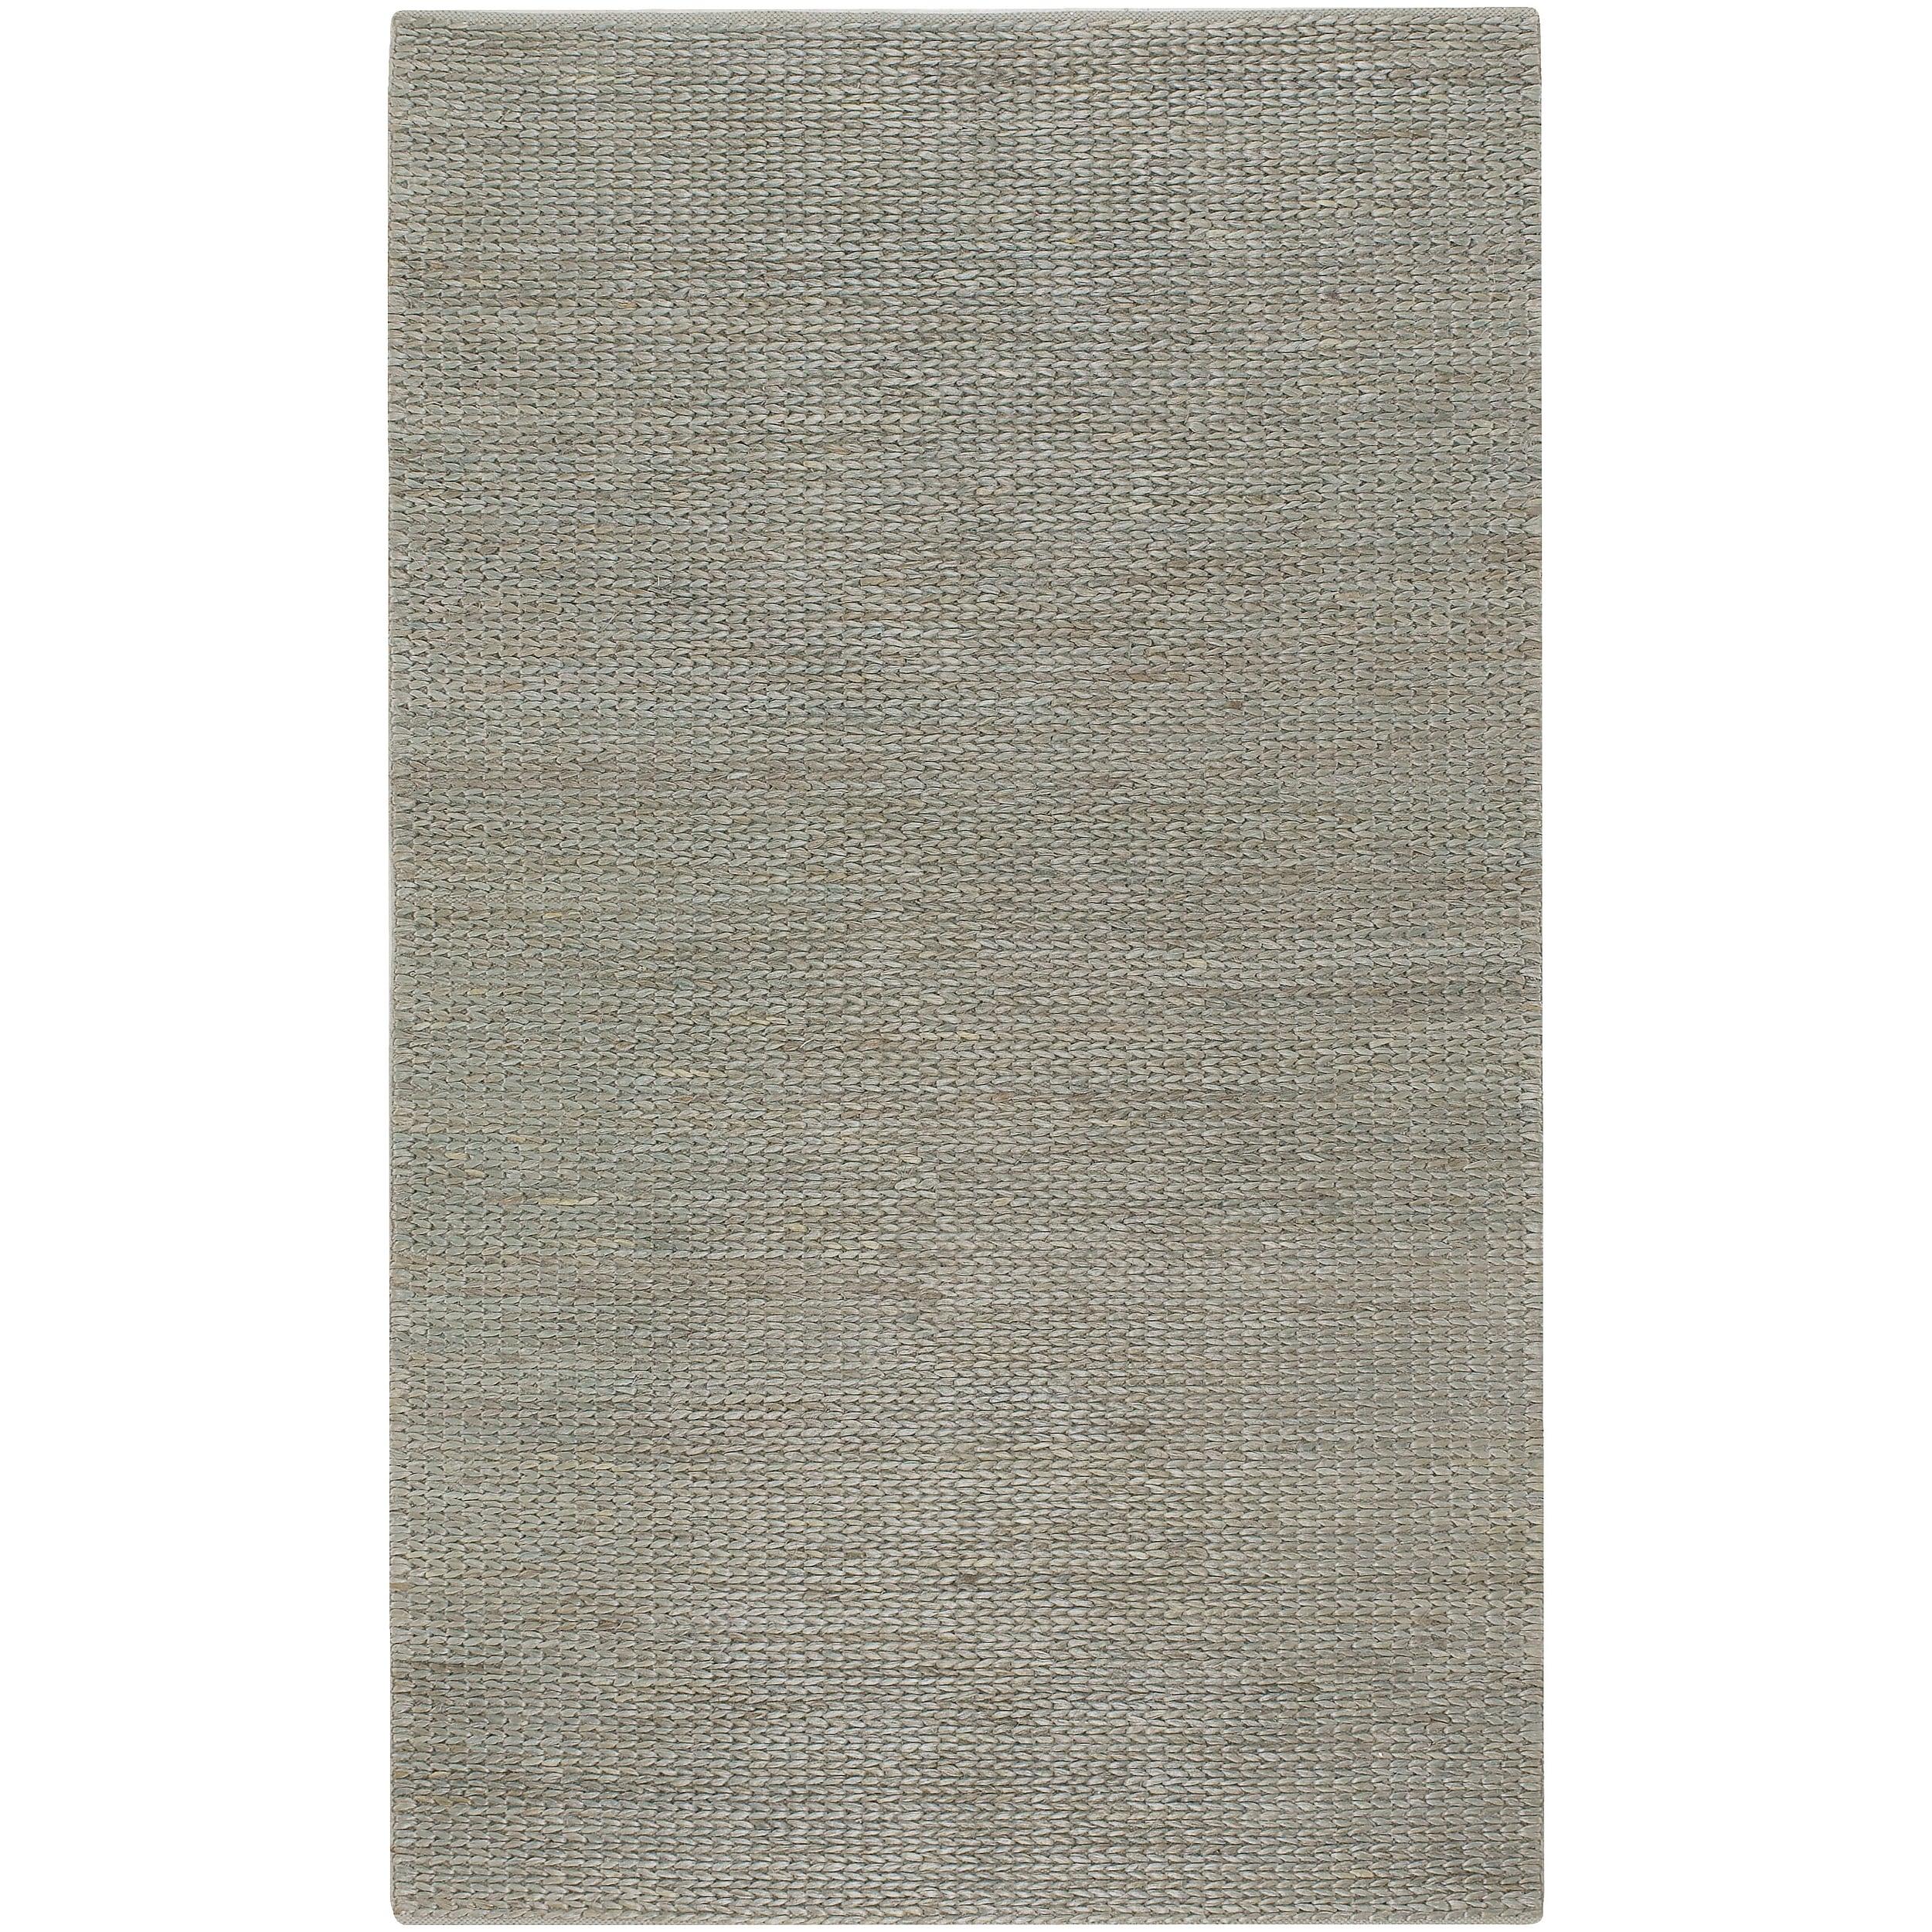 Hand Woven Gray Tropics Natural Fiber Jute Braided Texture